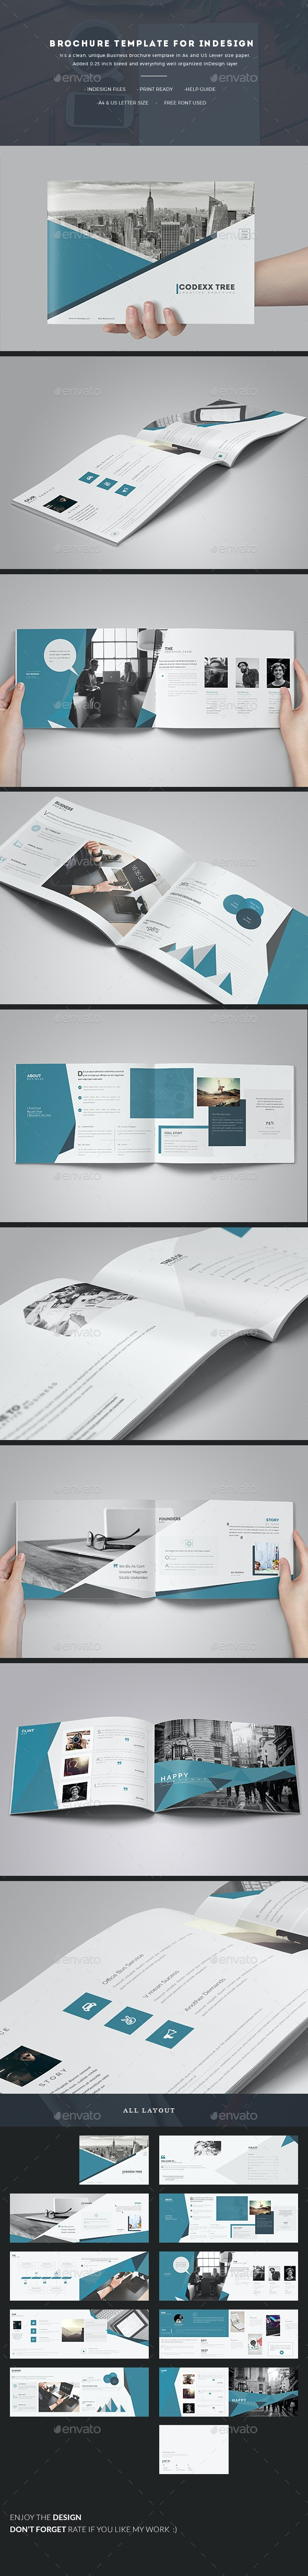 Brochure Template for InDesign - Corporate Brochures